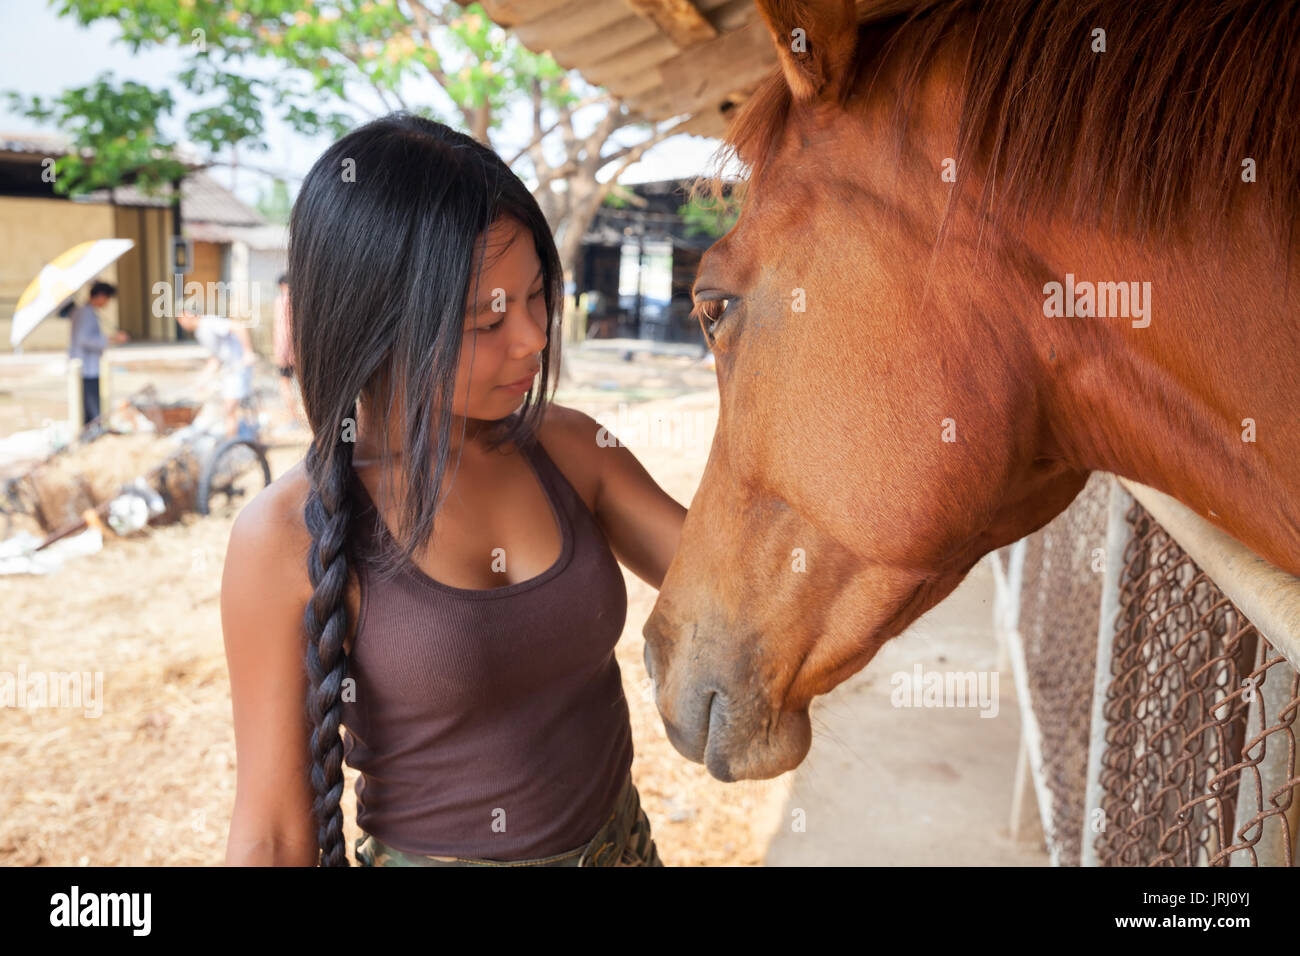 Horse face woman